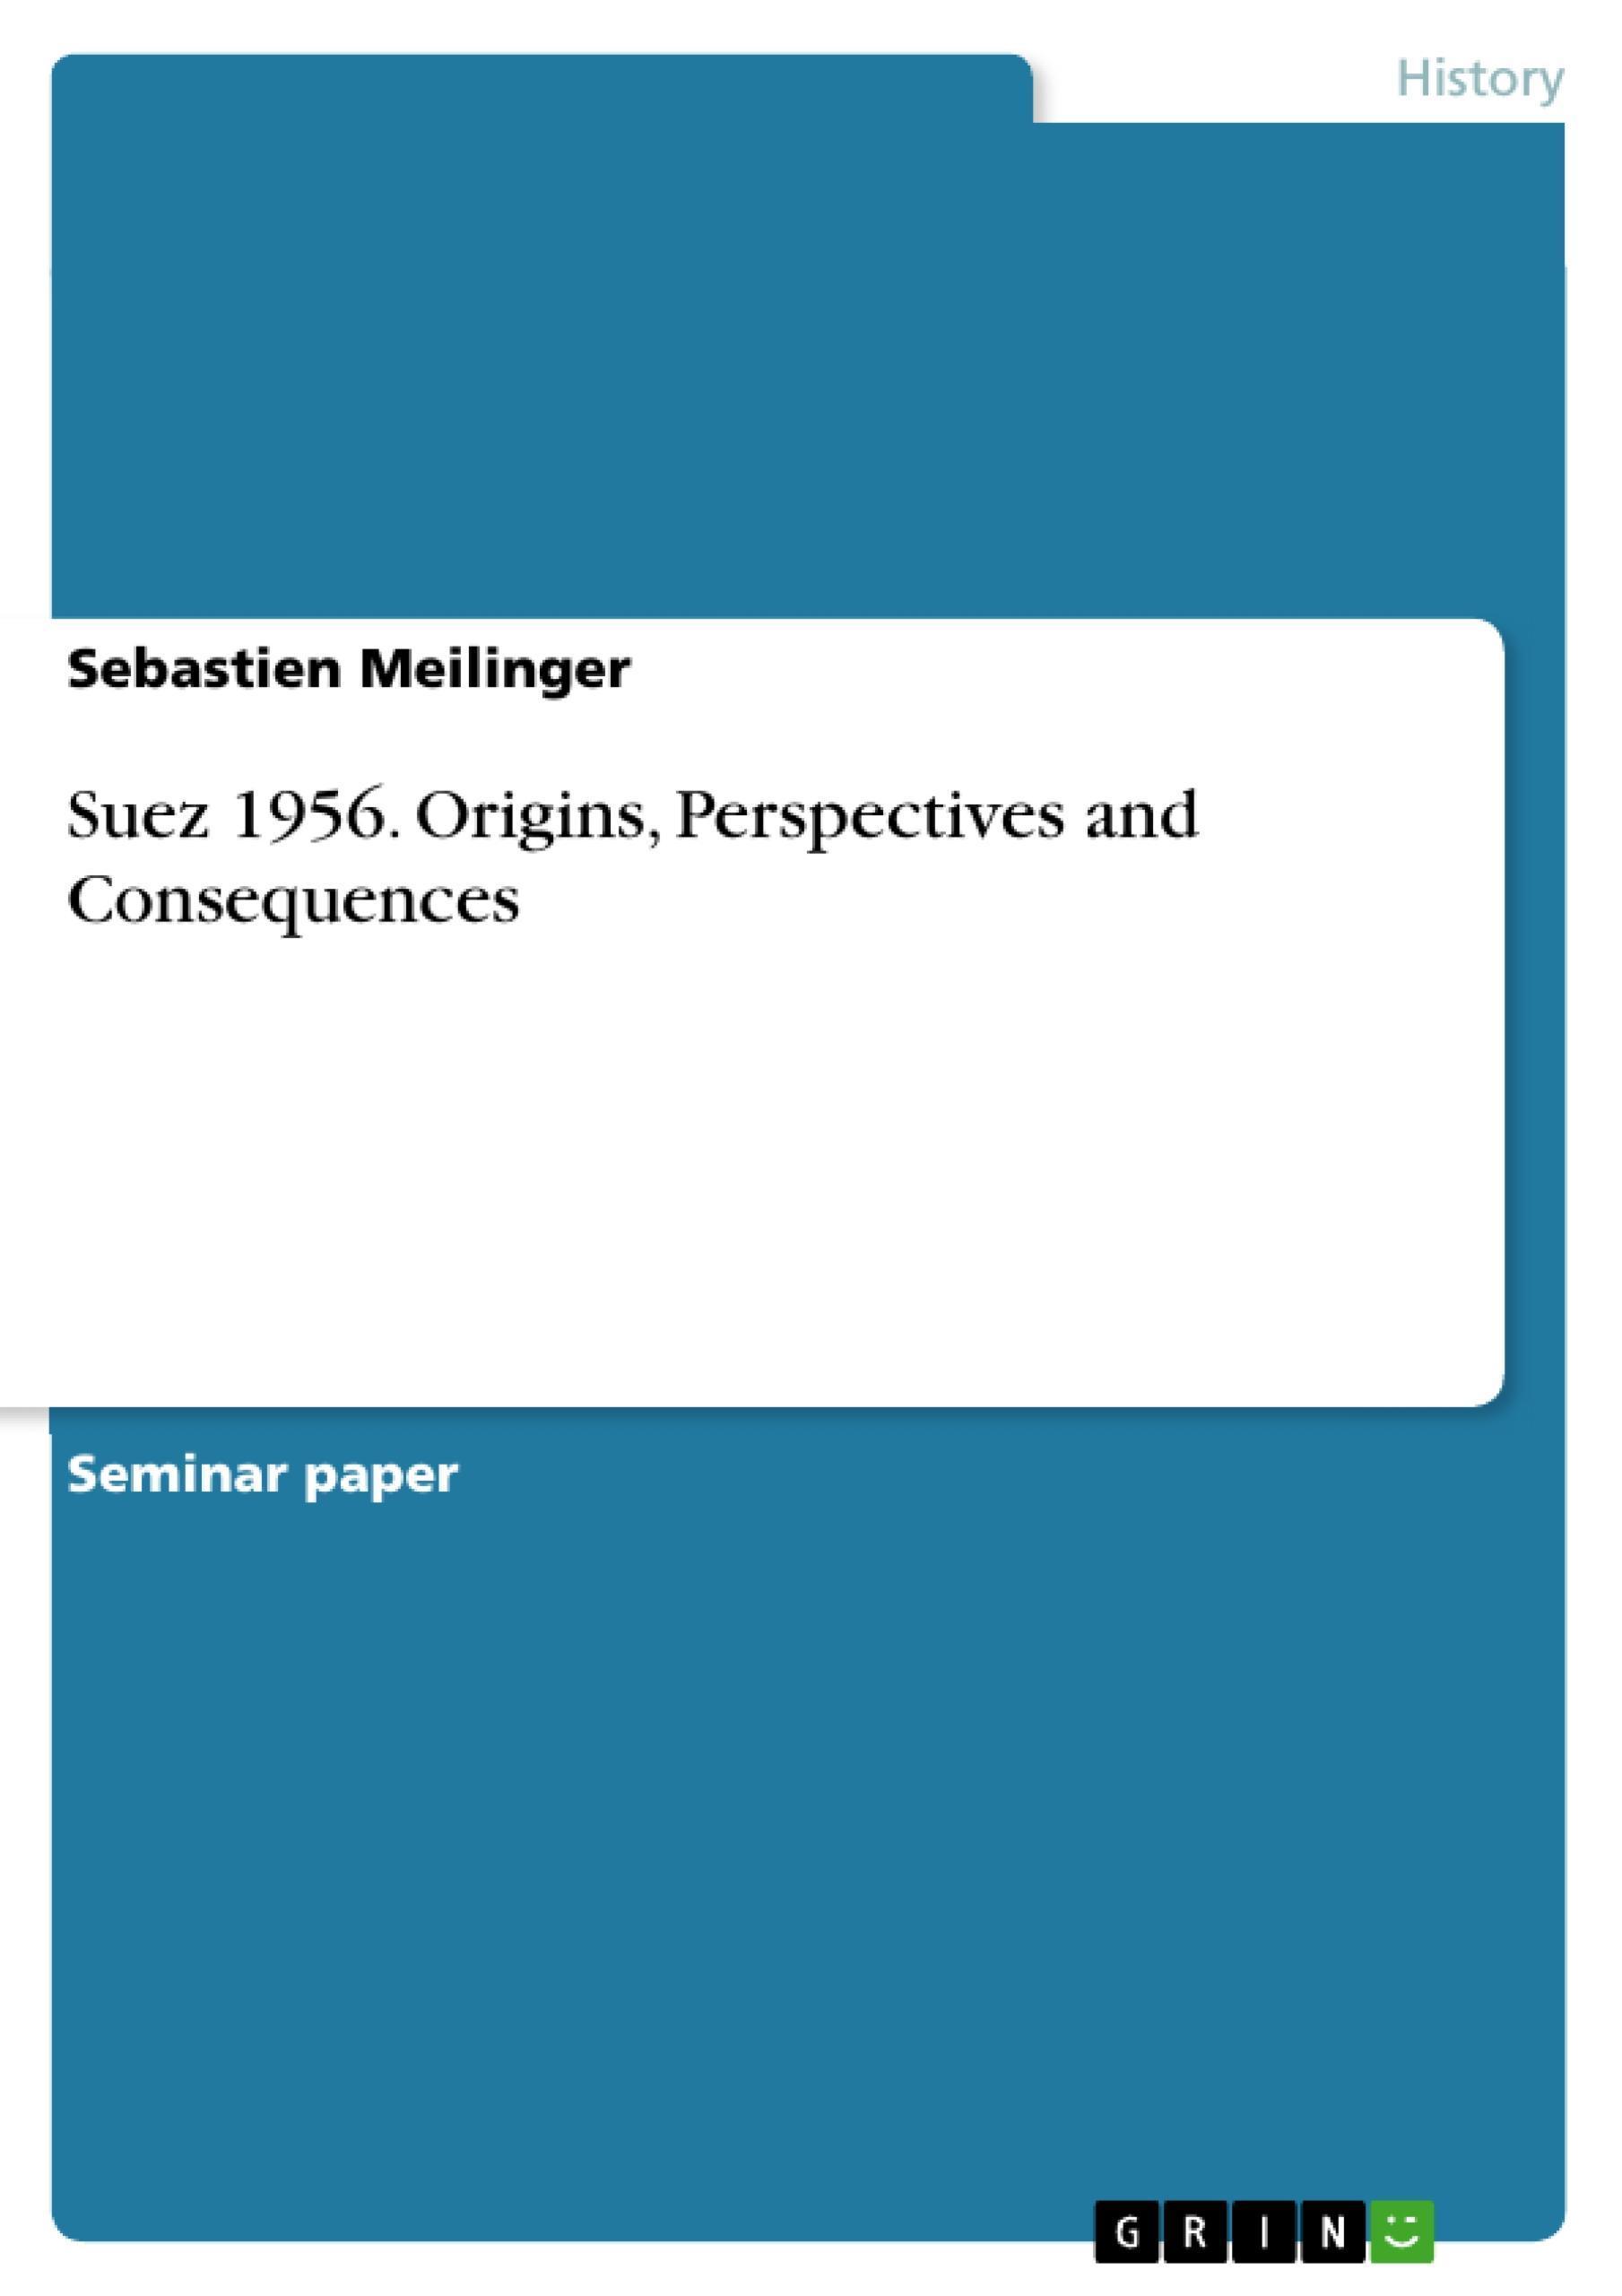 Suez-1956-Origins-Perspectives-and-Consequences-Sebastien-Meilinger